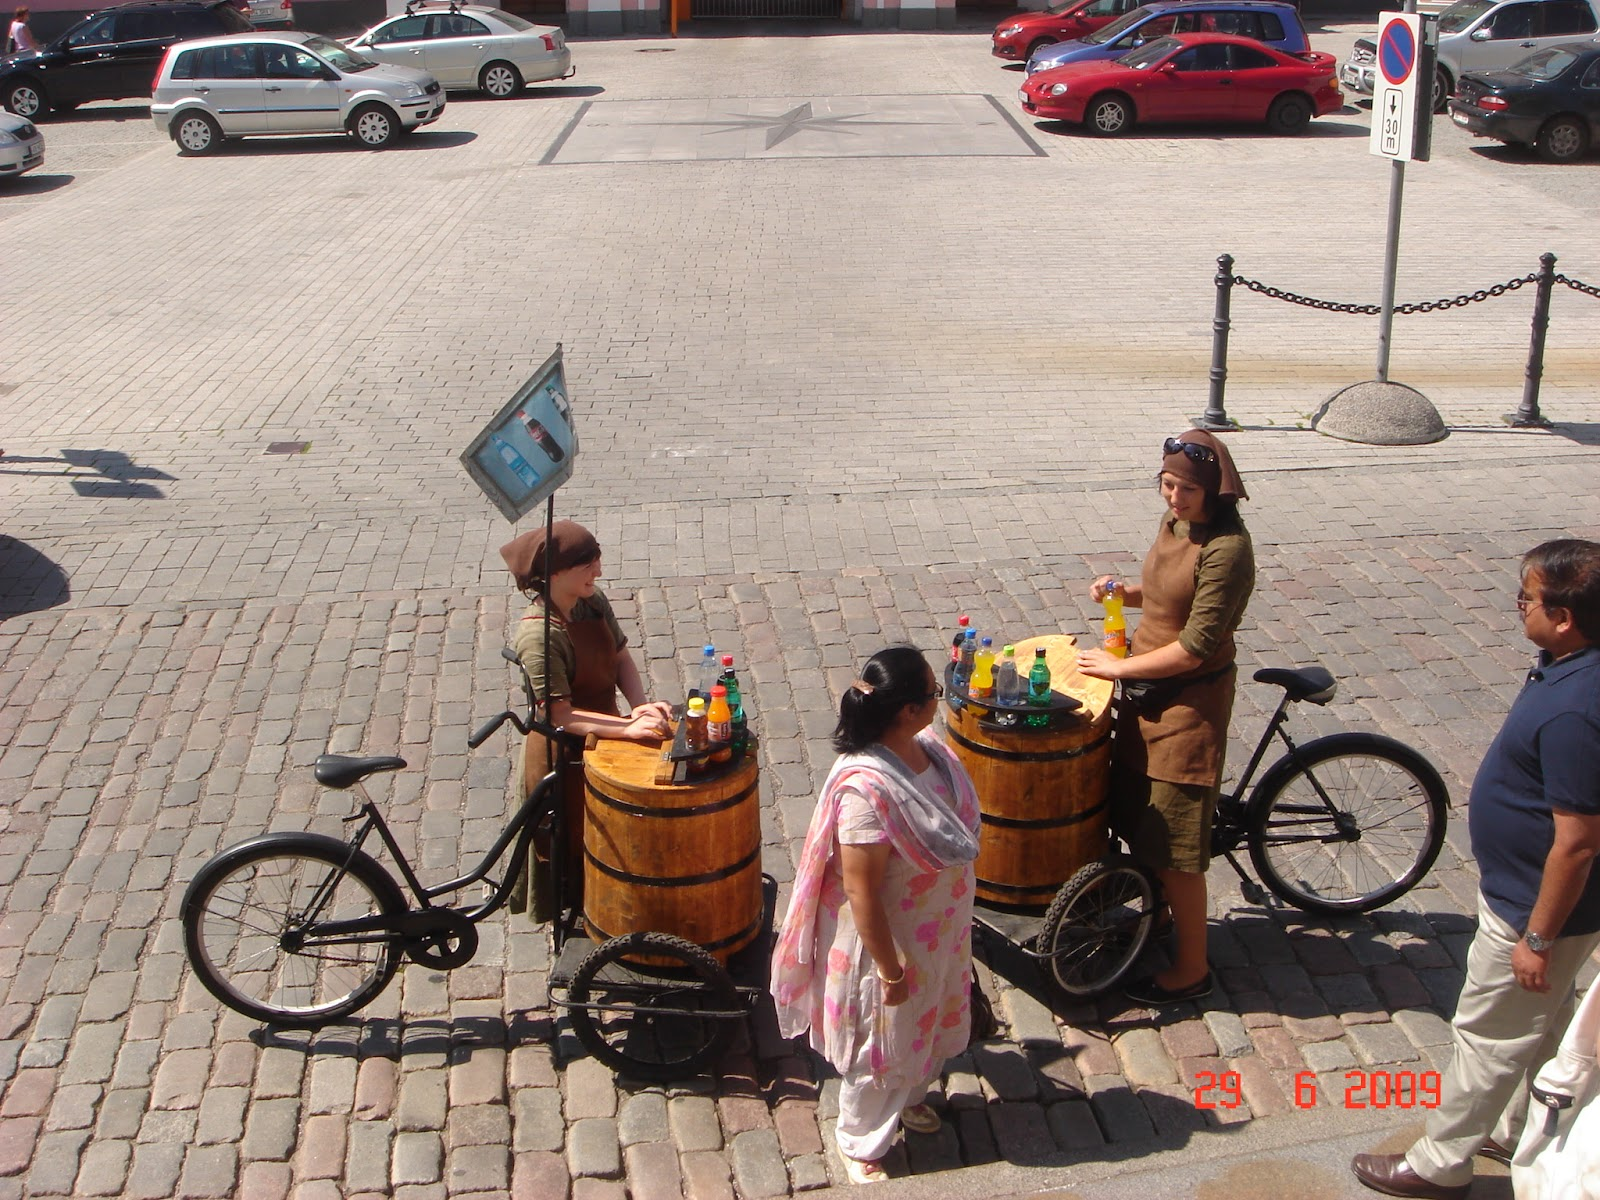 Medieval style coke vendor in Old town Tallinn